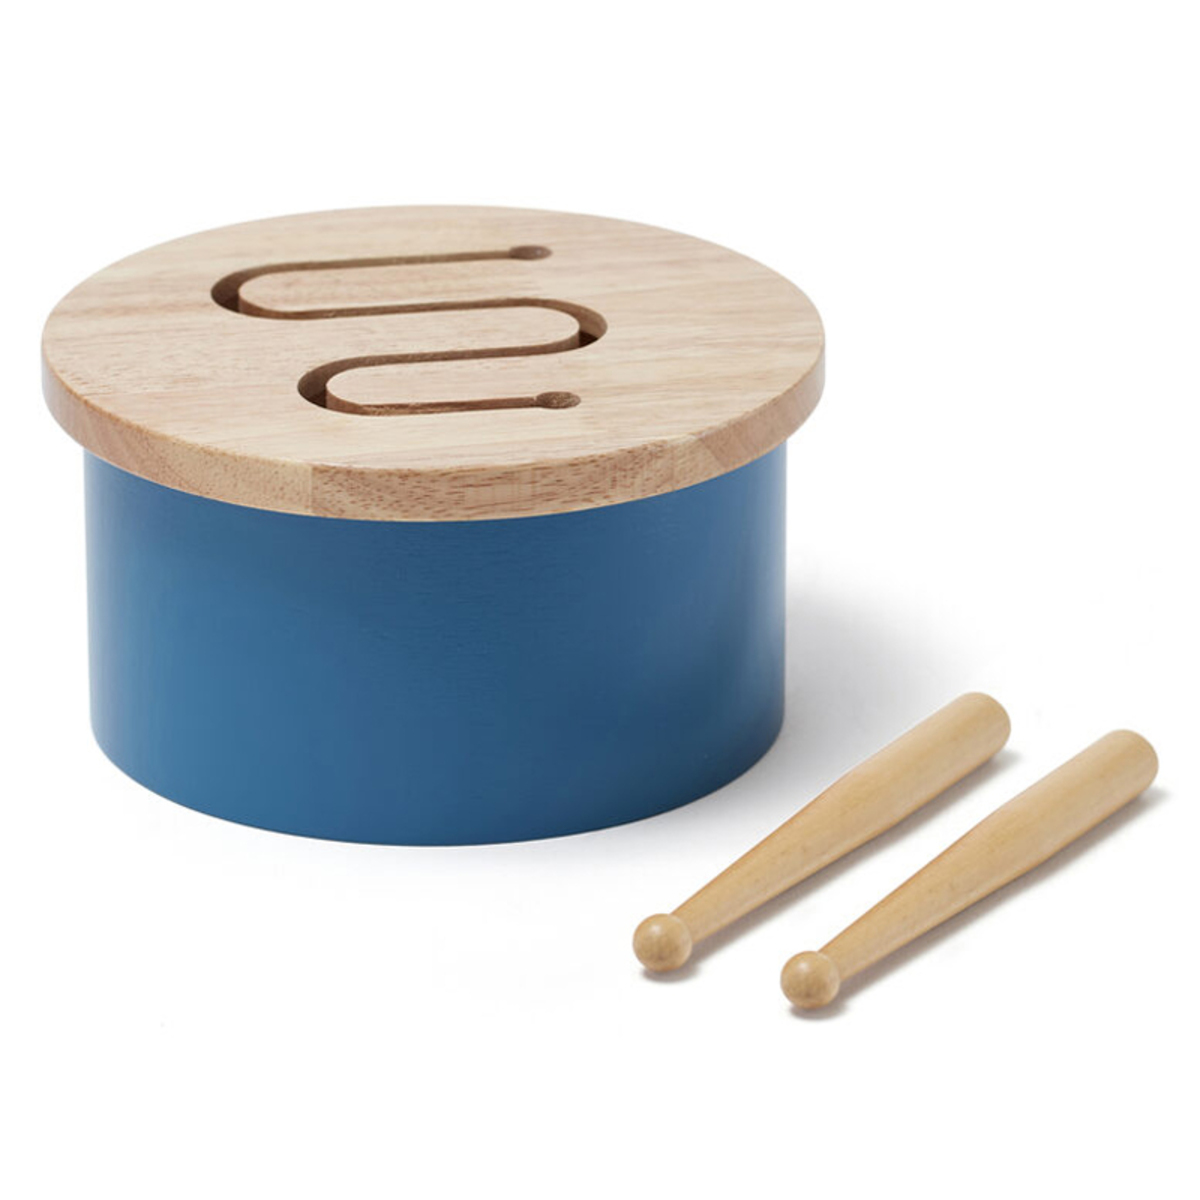 Mes premiers jouets Tambour Mini - Bleu Tambour Mini - Bleu